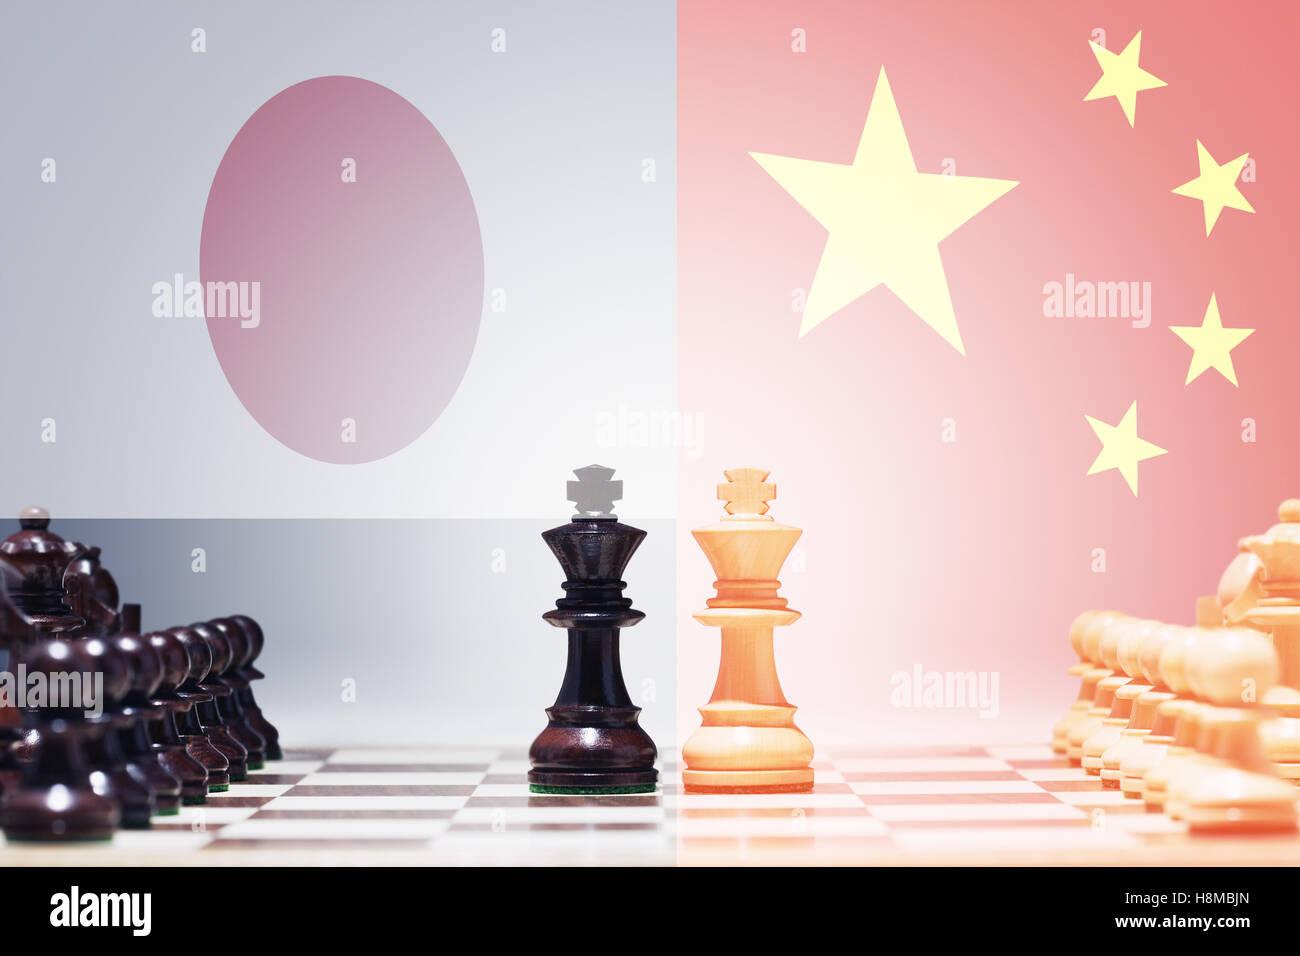 Chess game China vs Japan - Stock Image